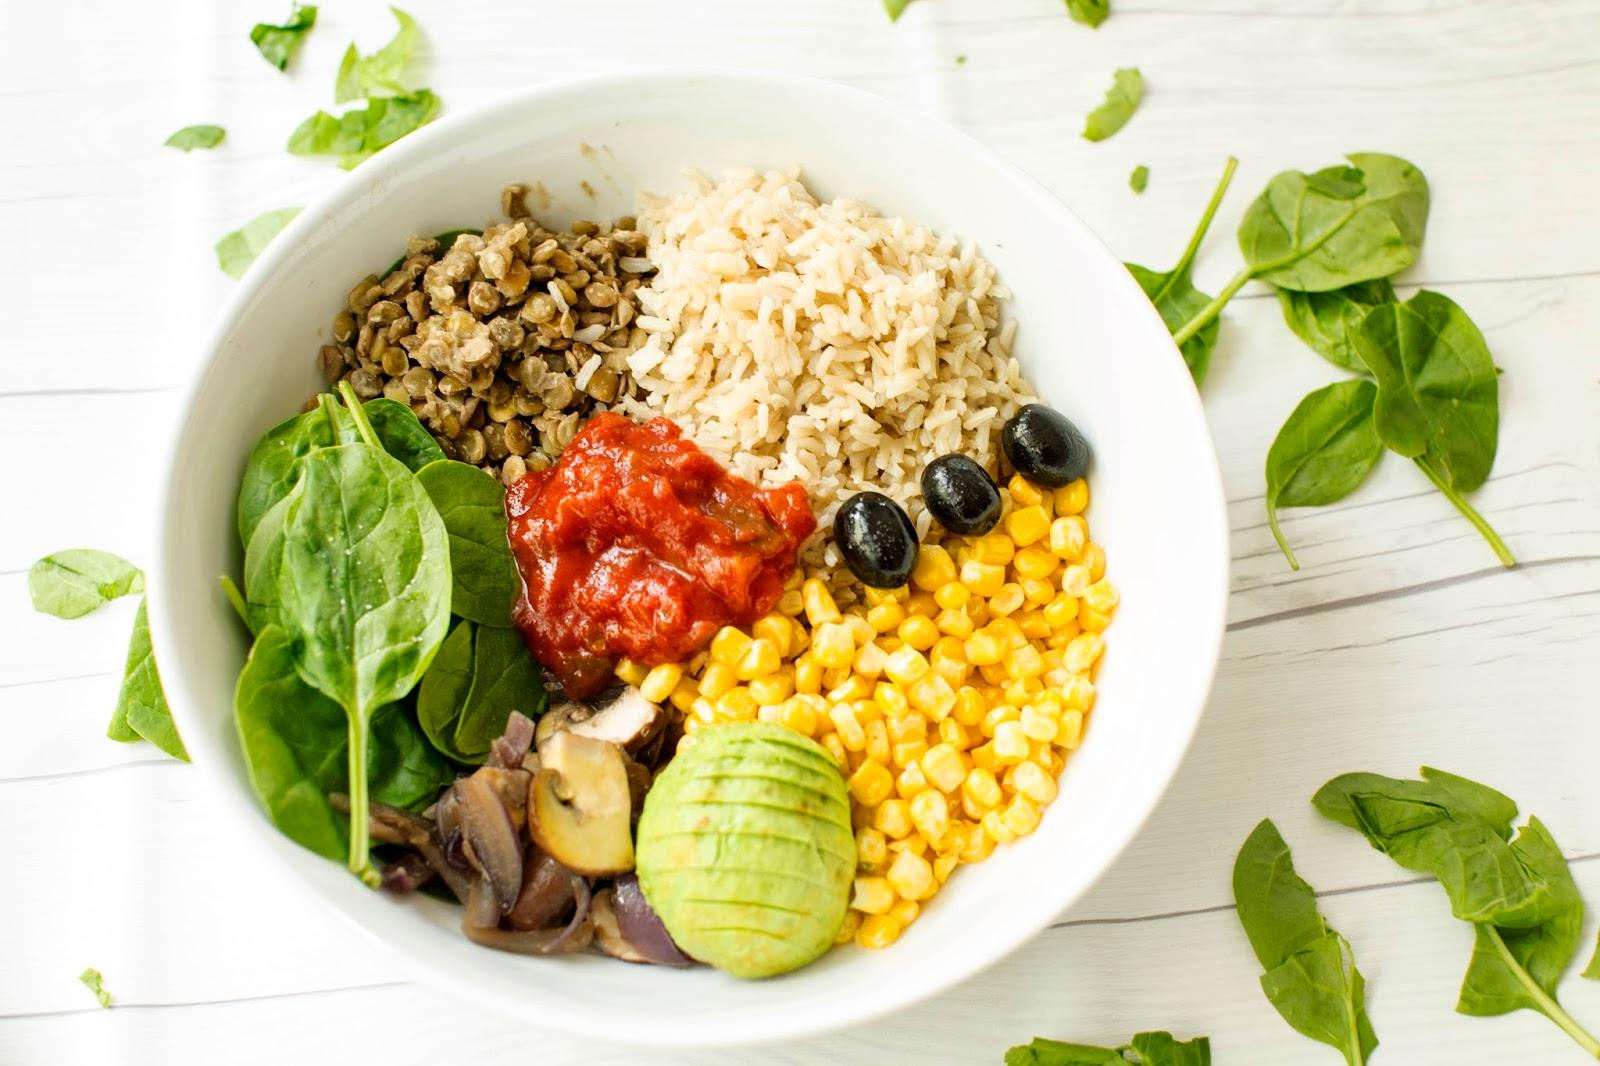 Healthy Vegan Taco Bowl